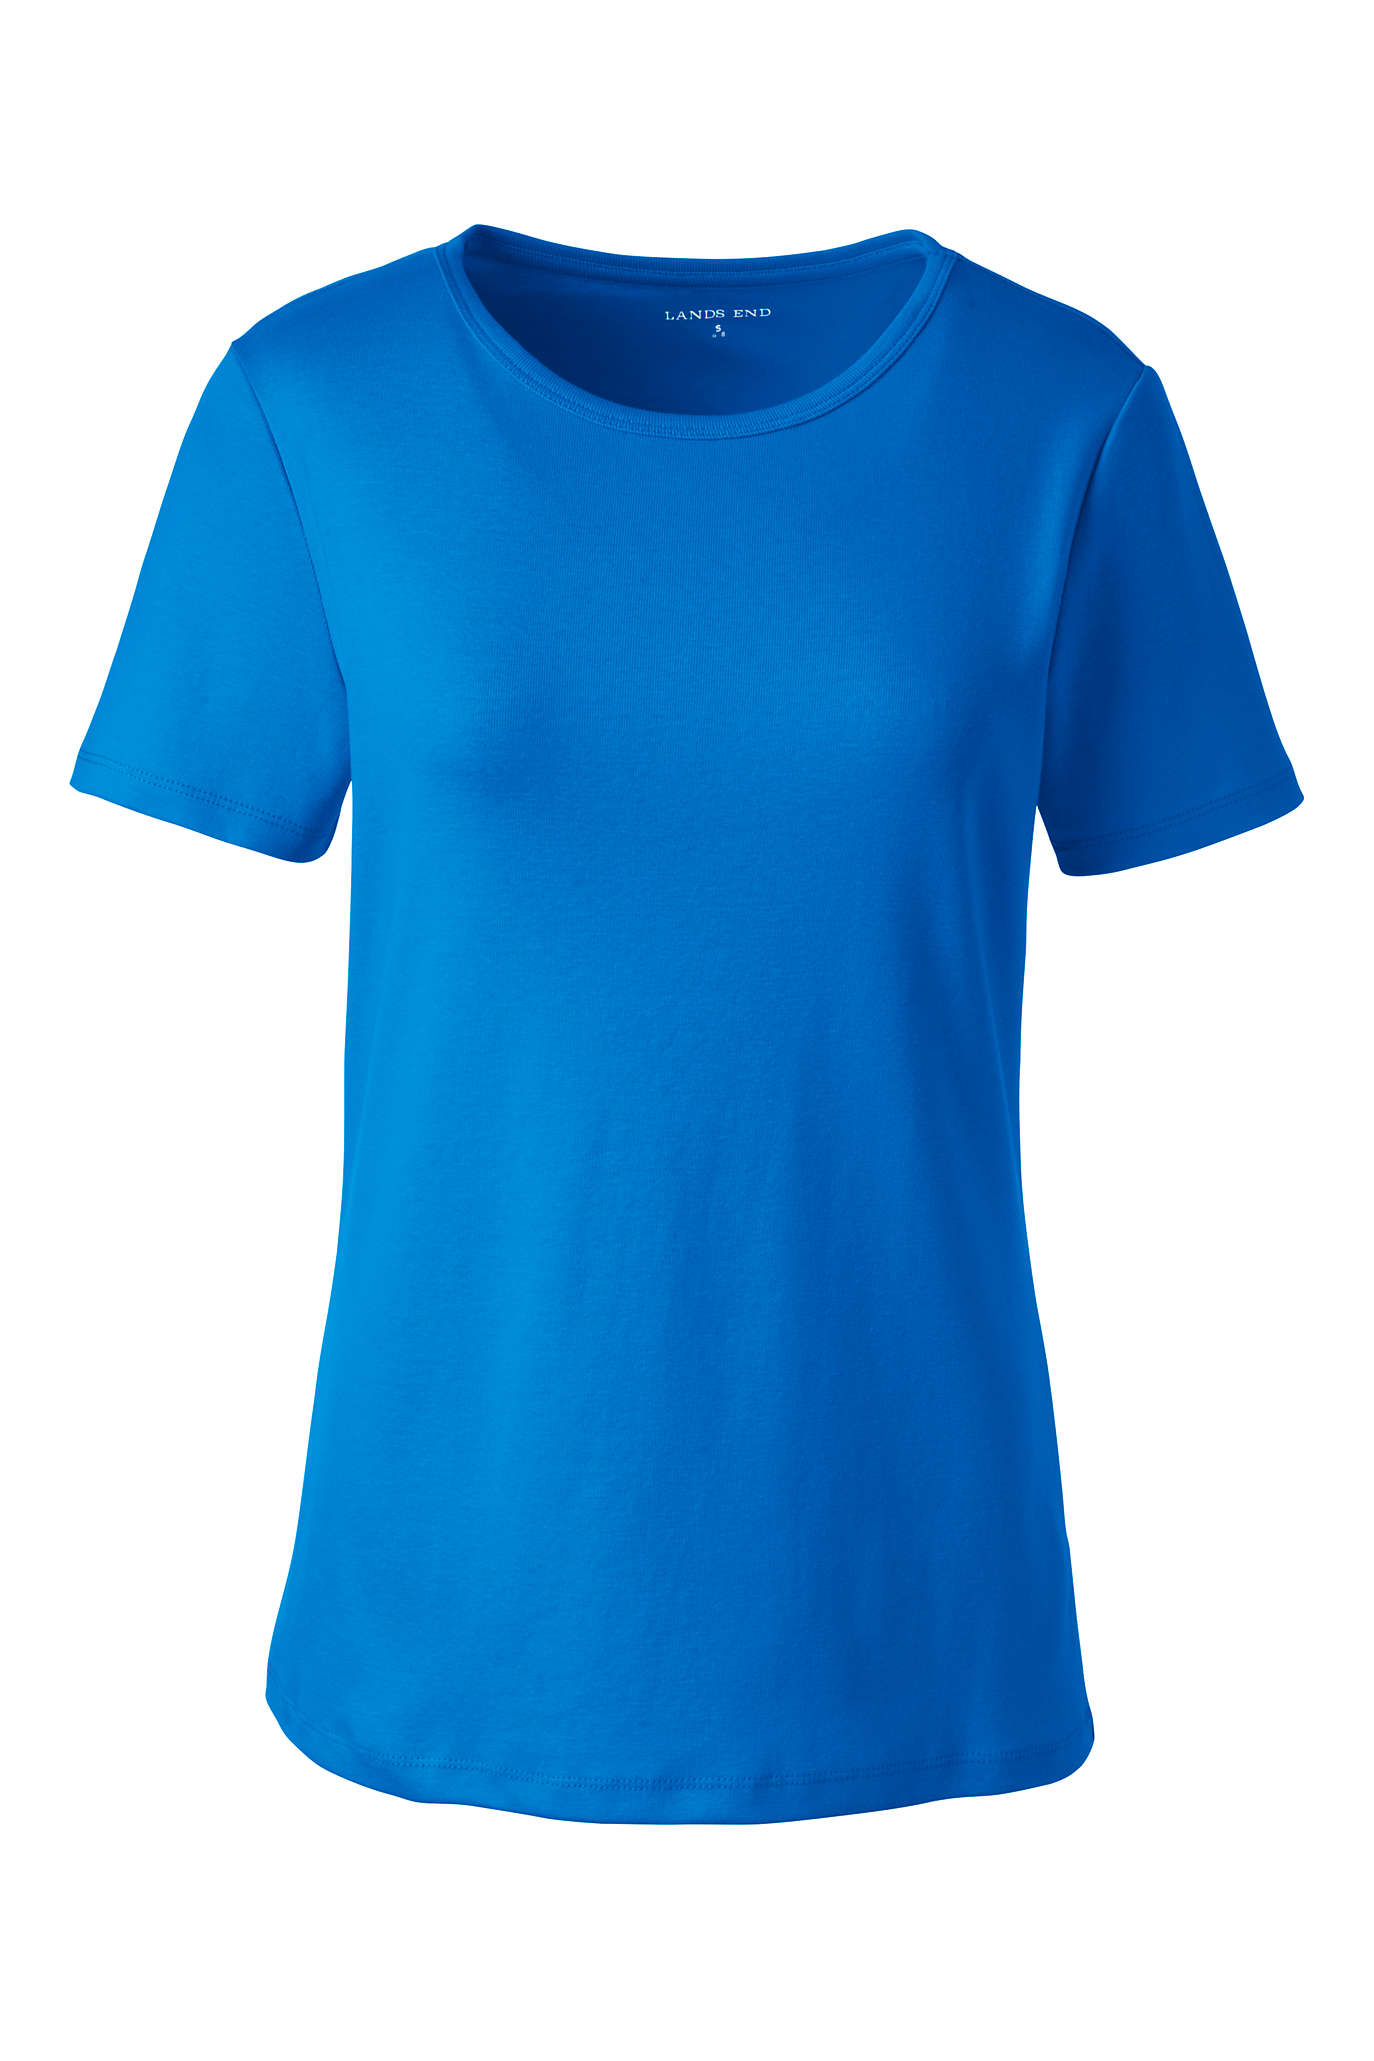 Women's Plus Size Rib Crew Neck Shirt